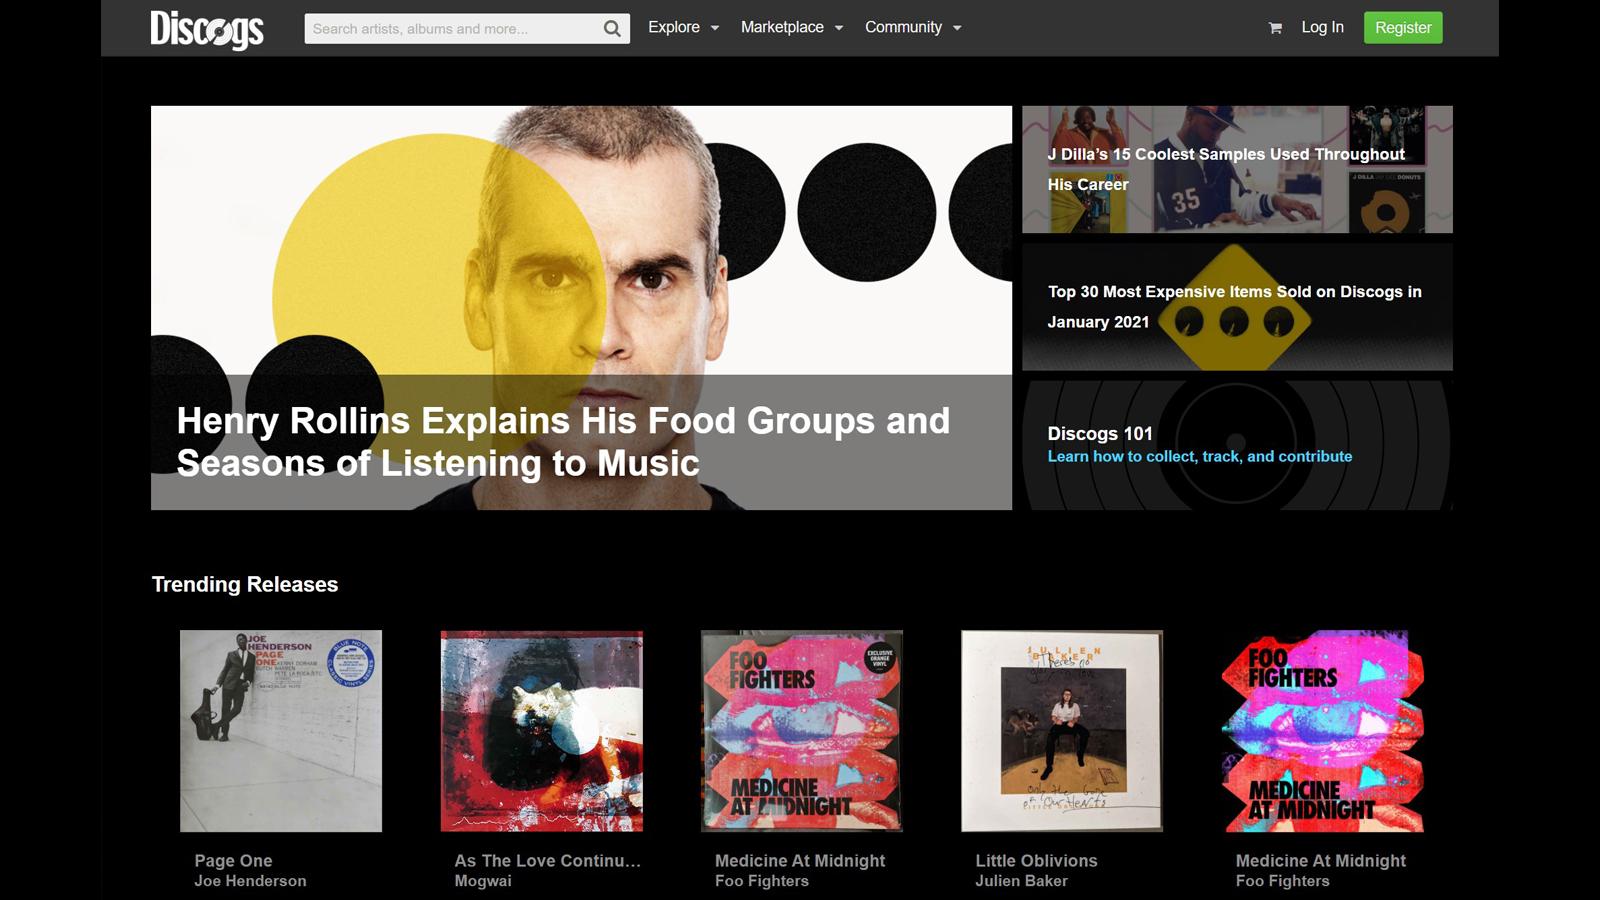 Discogs digital vinyl storefront